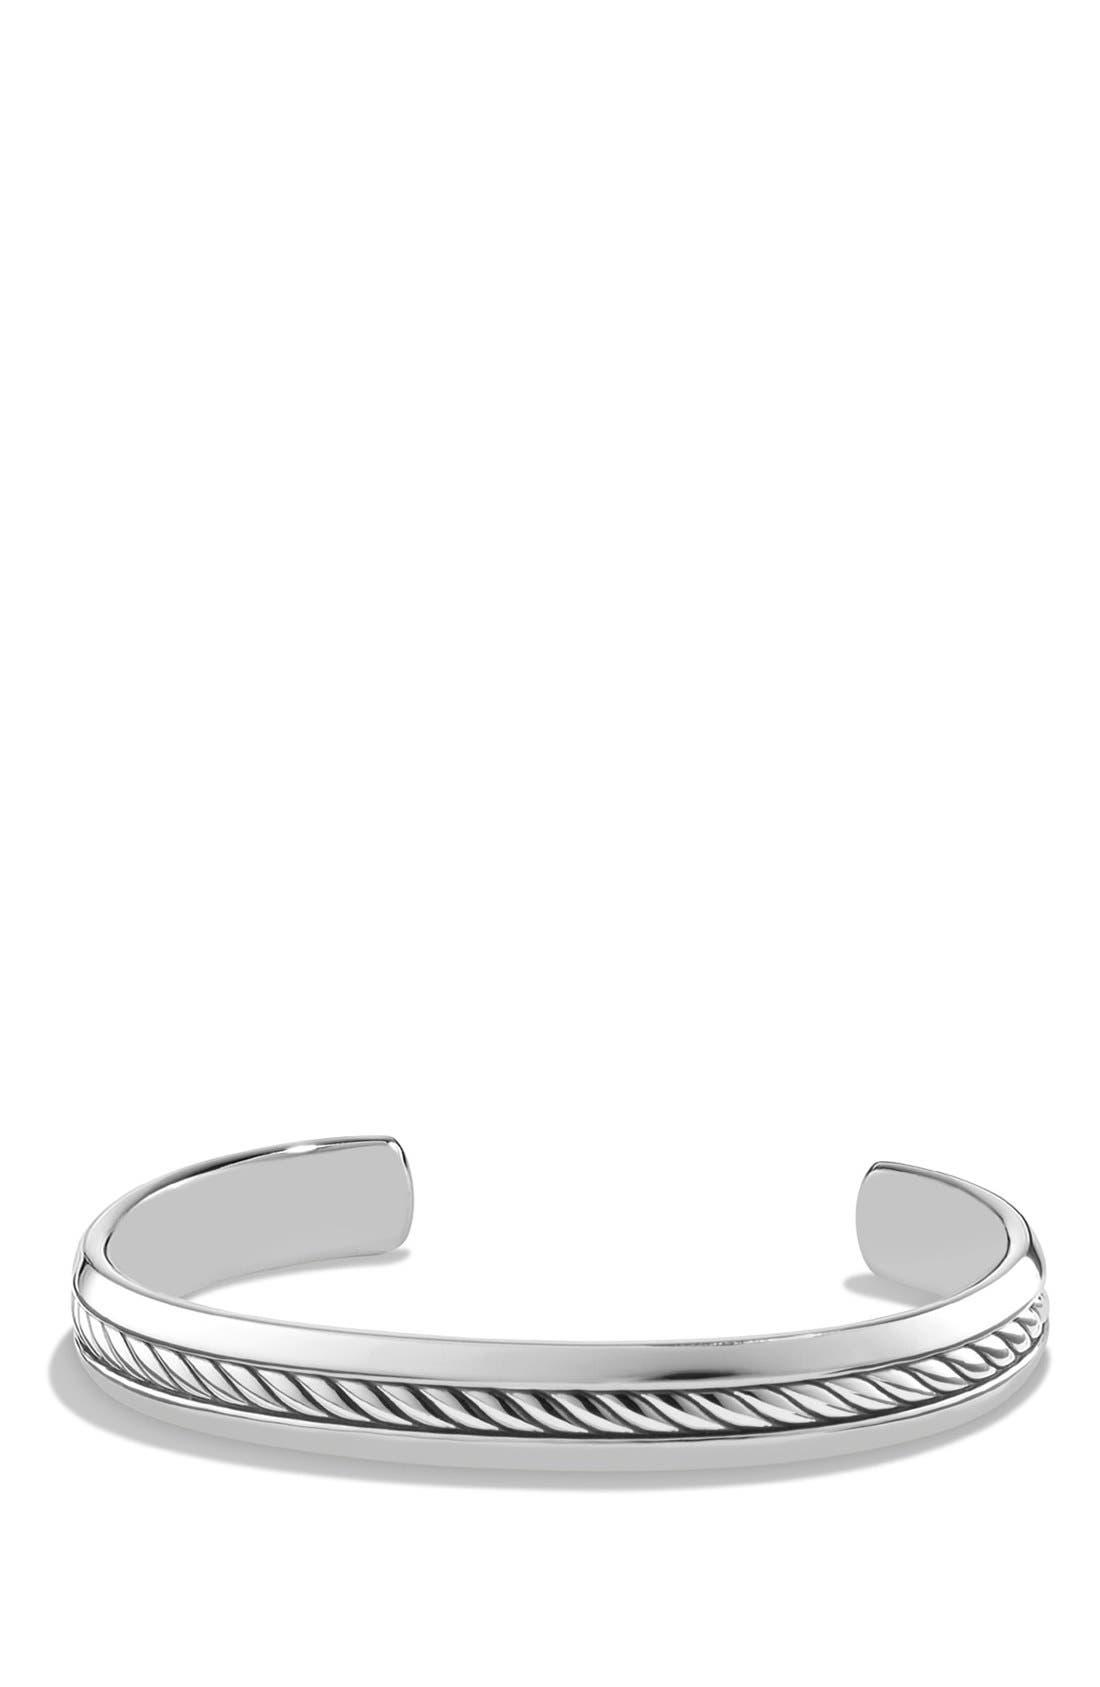 Main Image - David Yurman'Cable Classics' Chain Bracelet